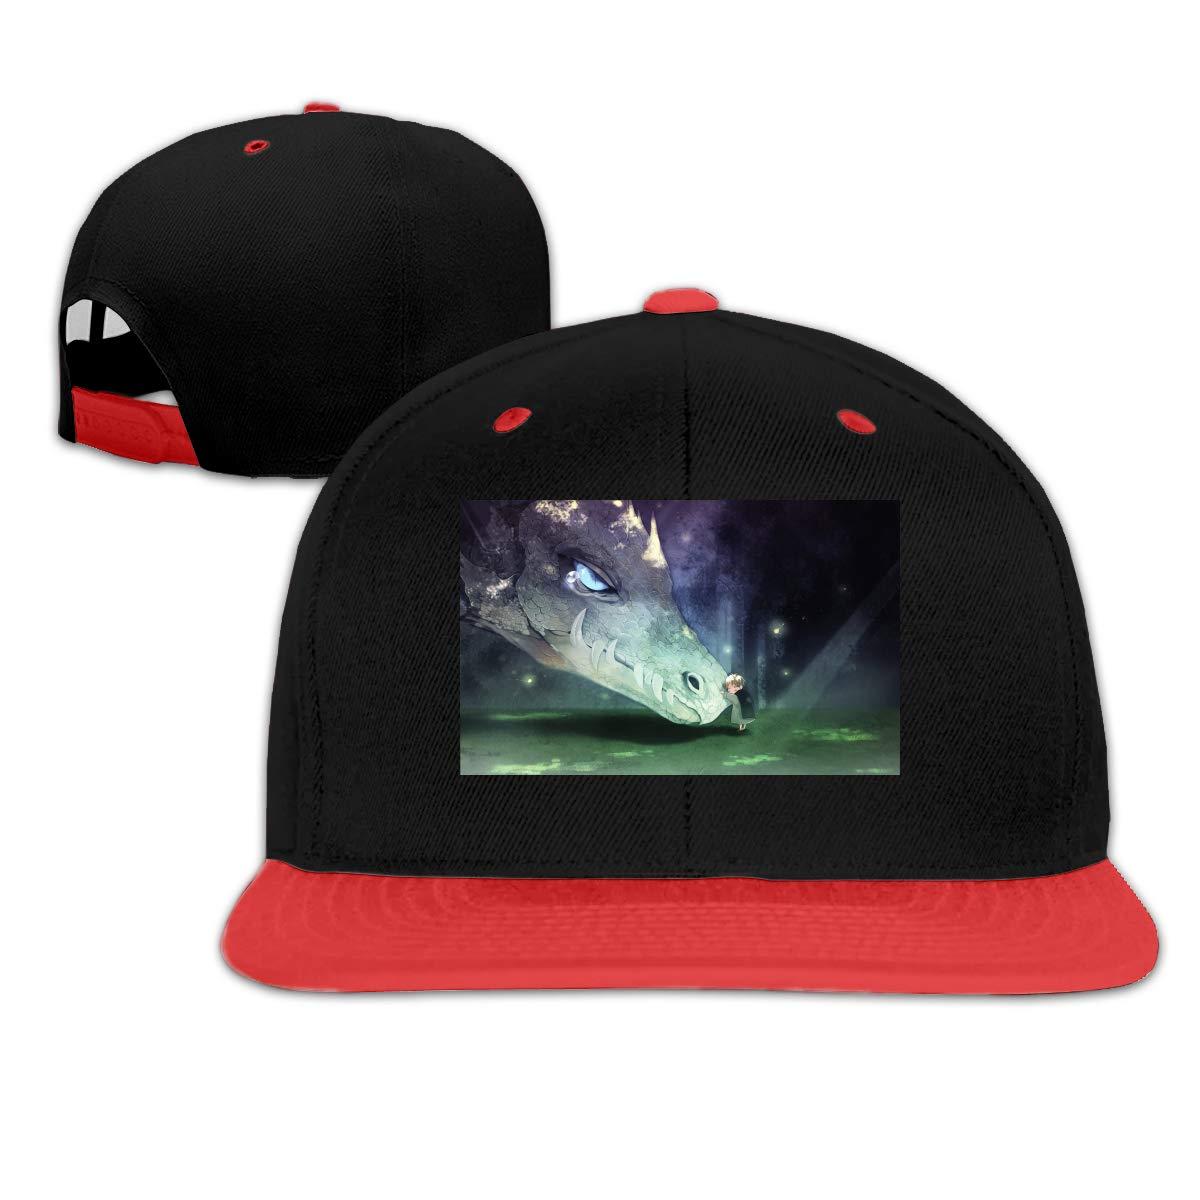 DRE2584WWF Anime Fantasy Dragon Boys and Girls Hip-Hop Baseball Cap Adjustable Cap